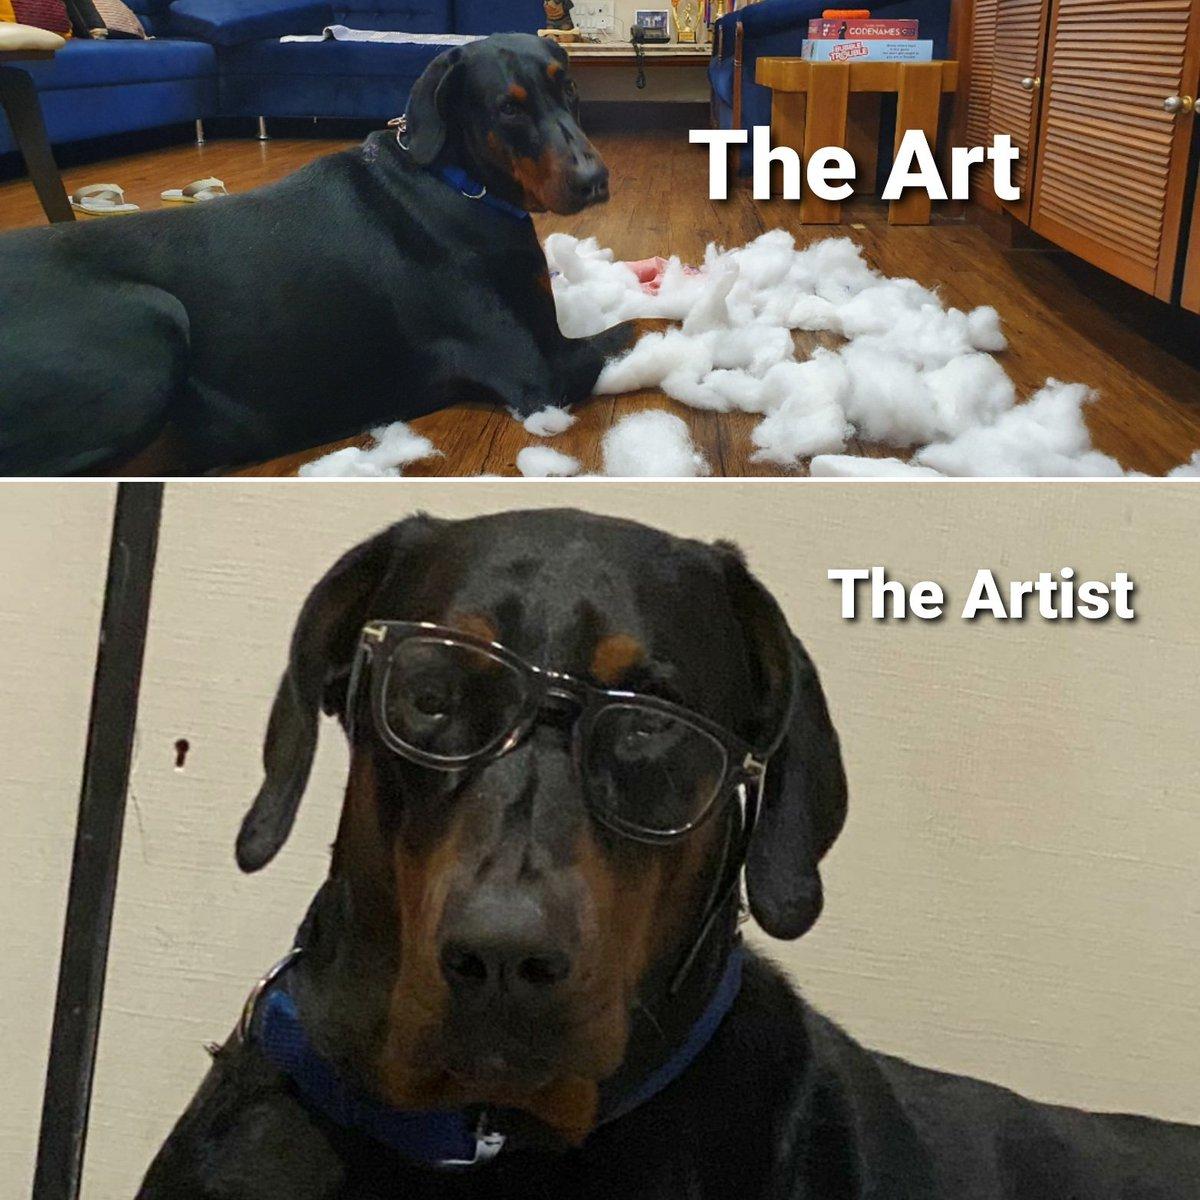 #theart #theartist   My boy after destroying yet another pillow for fun.. #Sniper #dogsduringlockdown   #DogsofTwittter #Doberman #dobermaninfinity #dobermanpride #dogsofinstagram #doglovers #doglove  #dogs #doglife #dogcelebrationpic.twitter.com/yIk54DDBd0